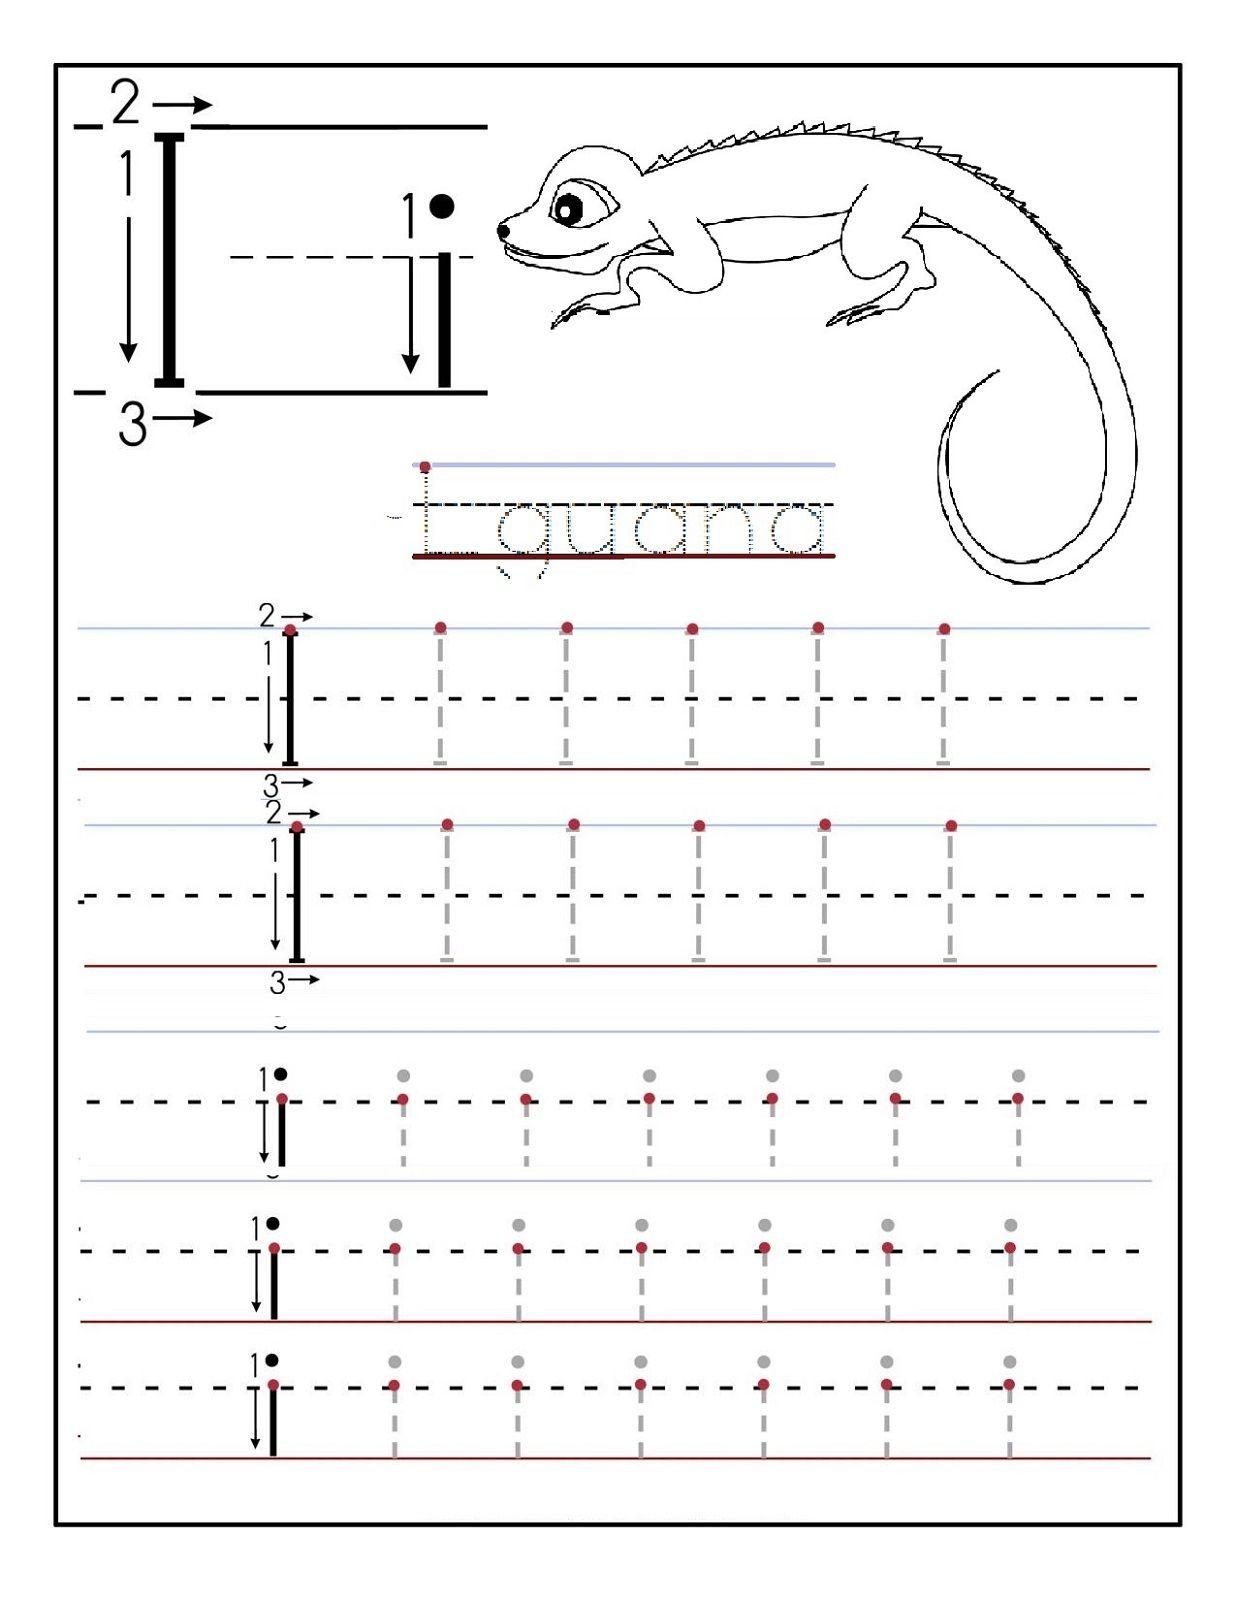 Preschool Printable Worksheets Tracing Worksheets Preschool Letter I Worksheet Preschool Tracing [ 1600 x 1236 Pixel ]